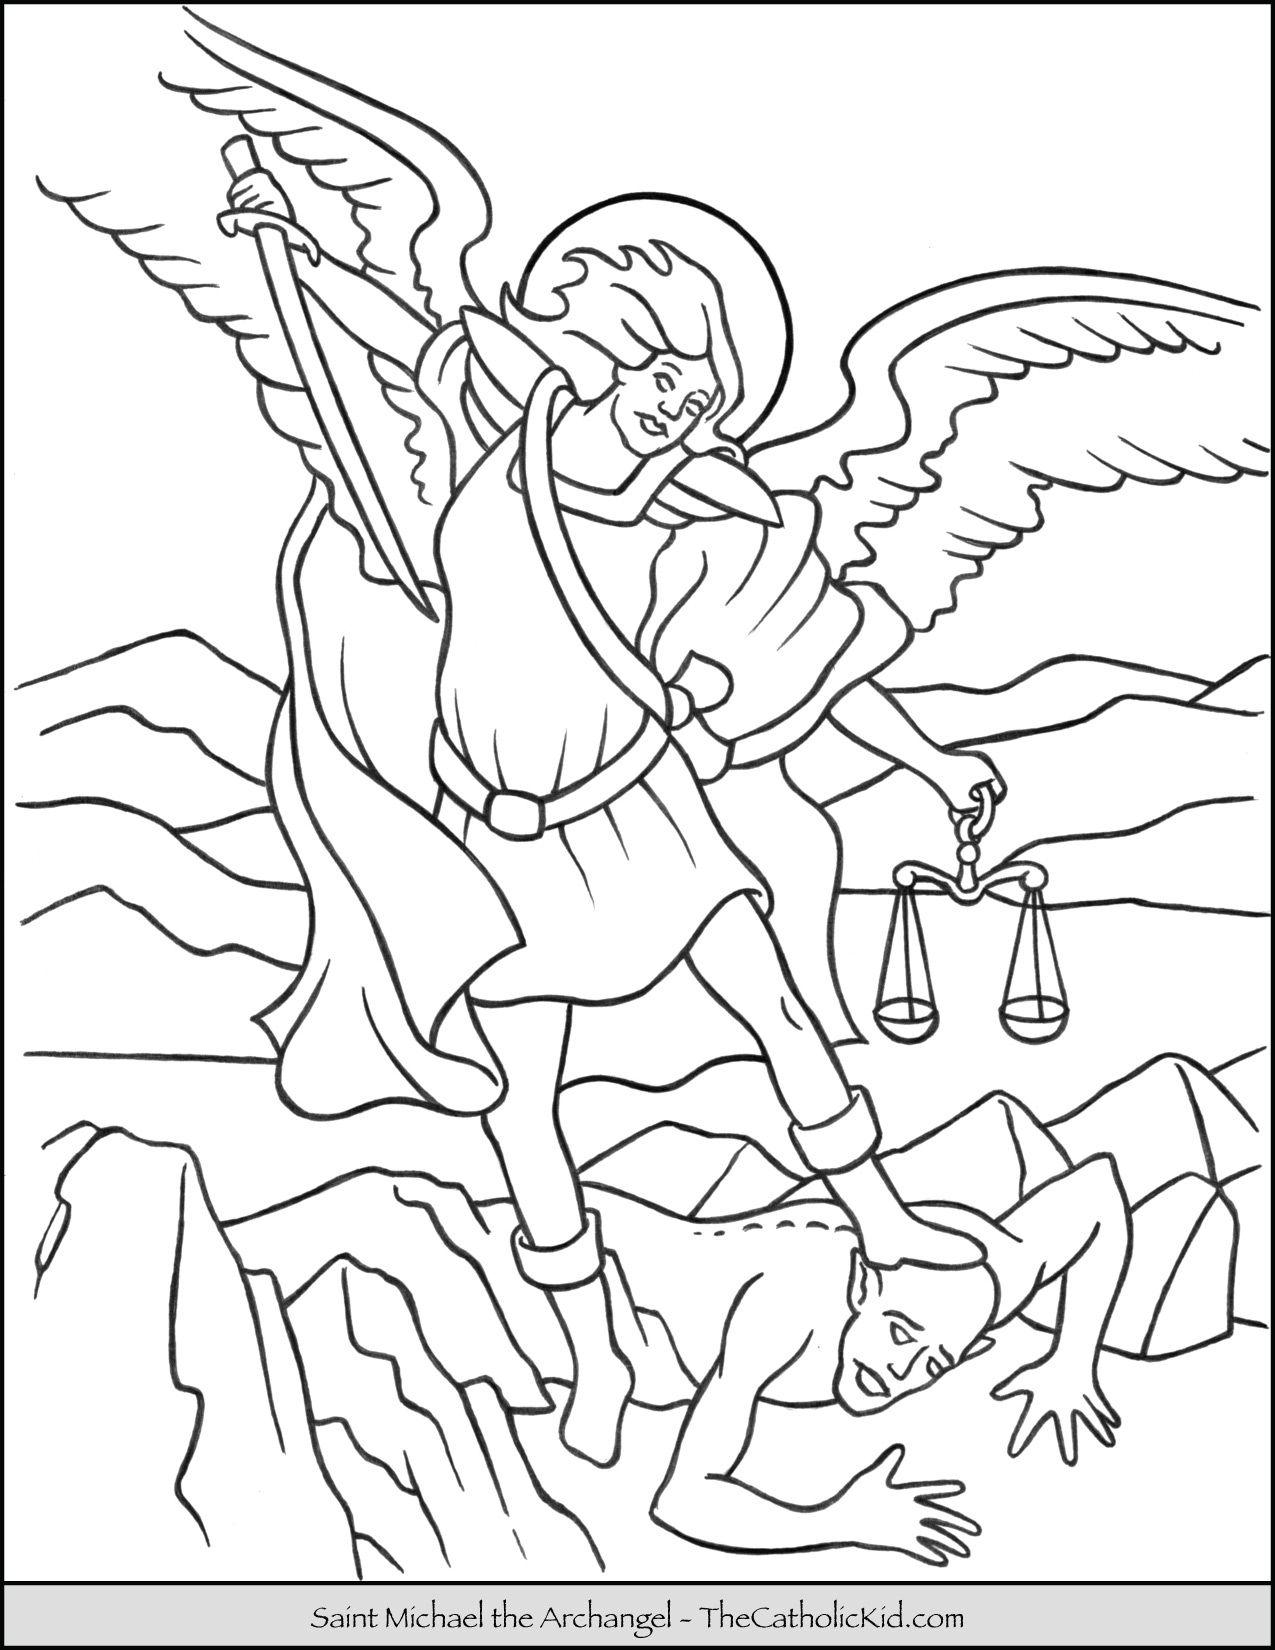 Saint Michael Archangel Coloring Page | Catholic Coloring